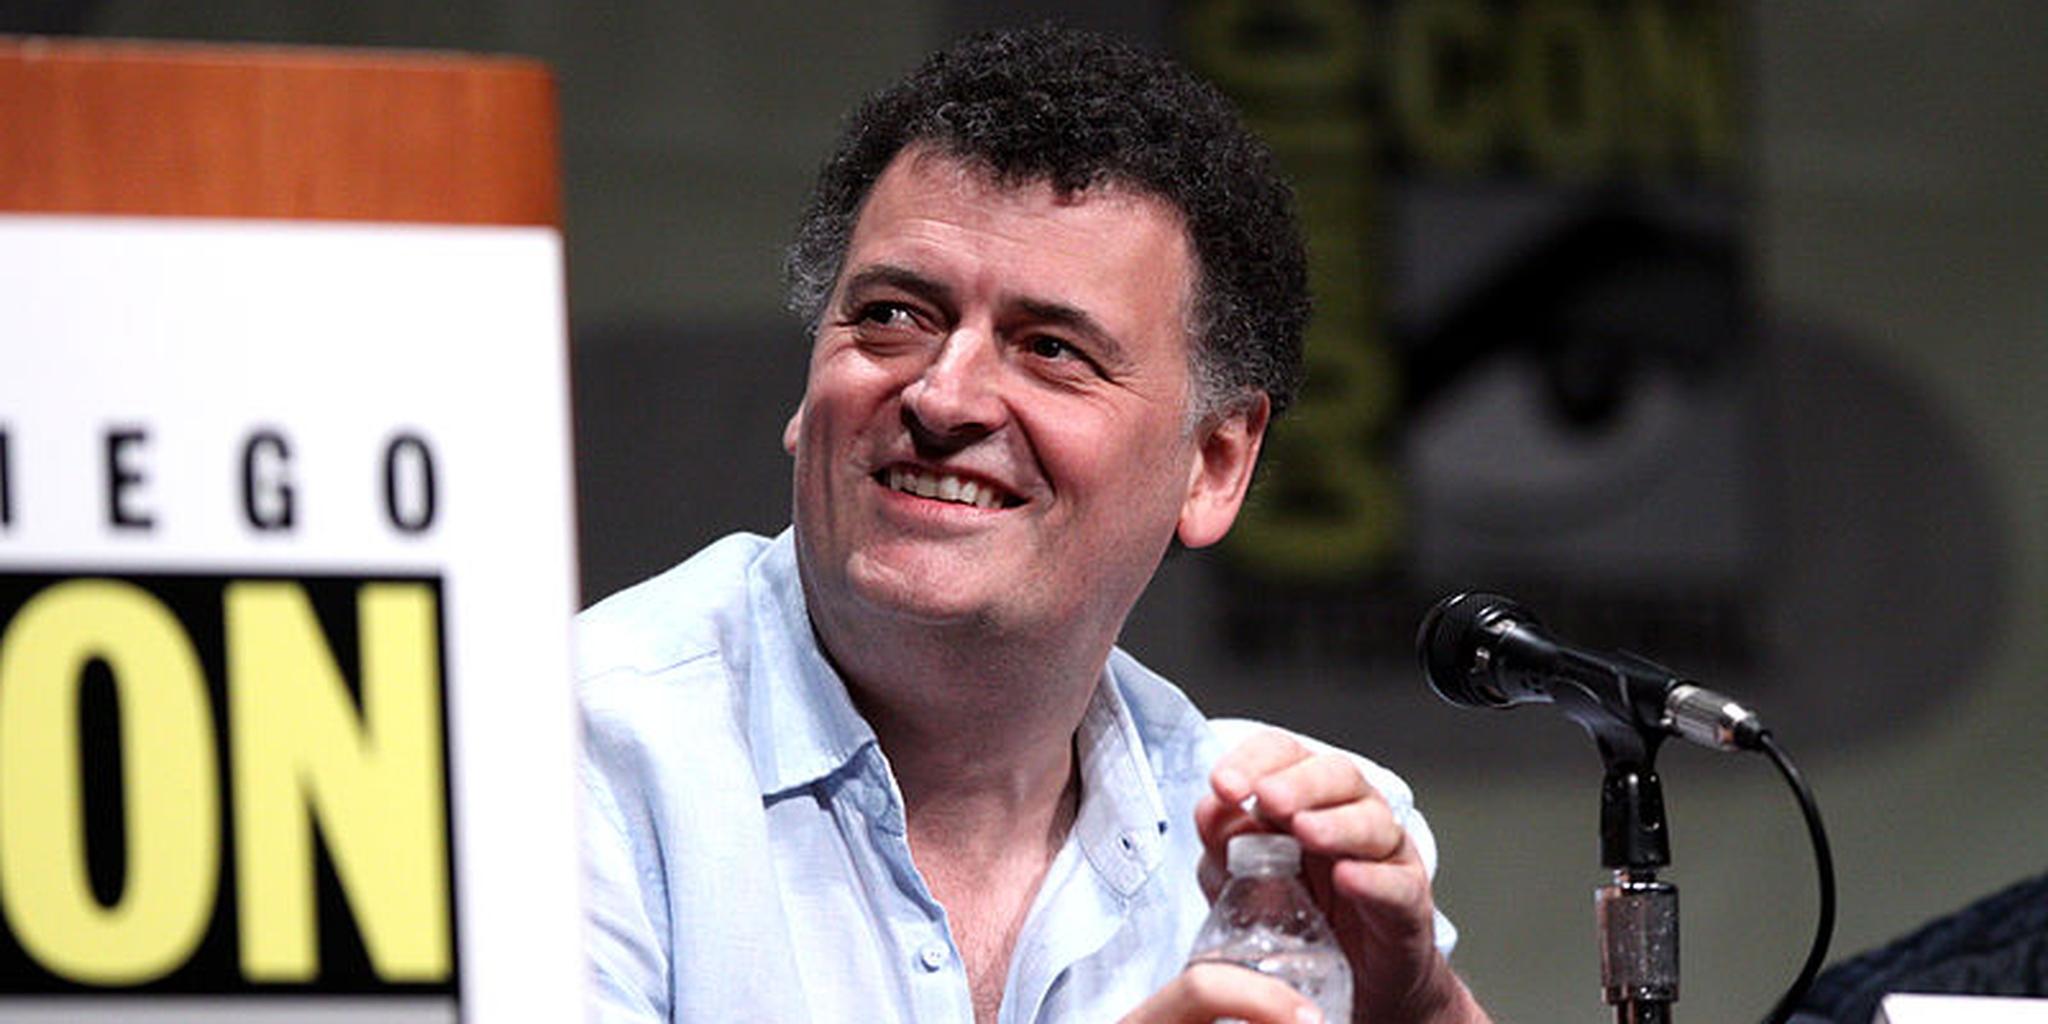 File:Steven Moffat (7606539736).jpg - Wikimedia Commons